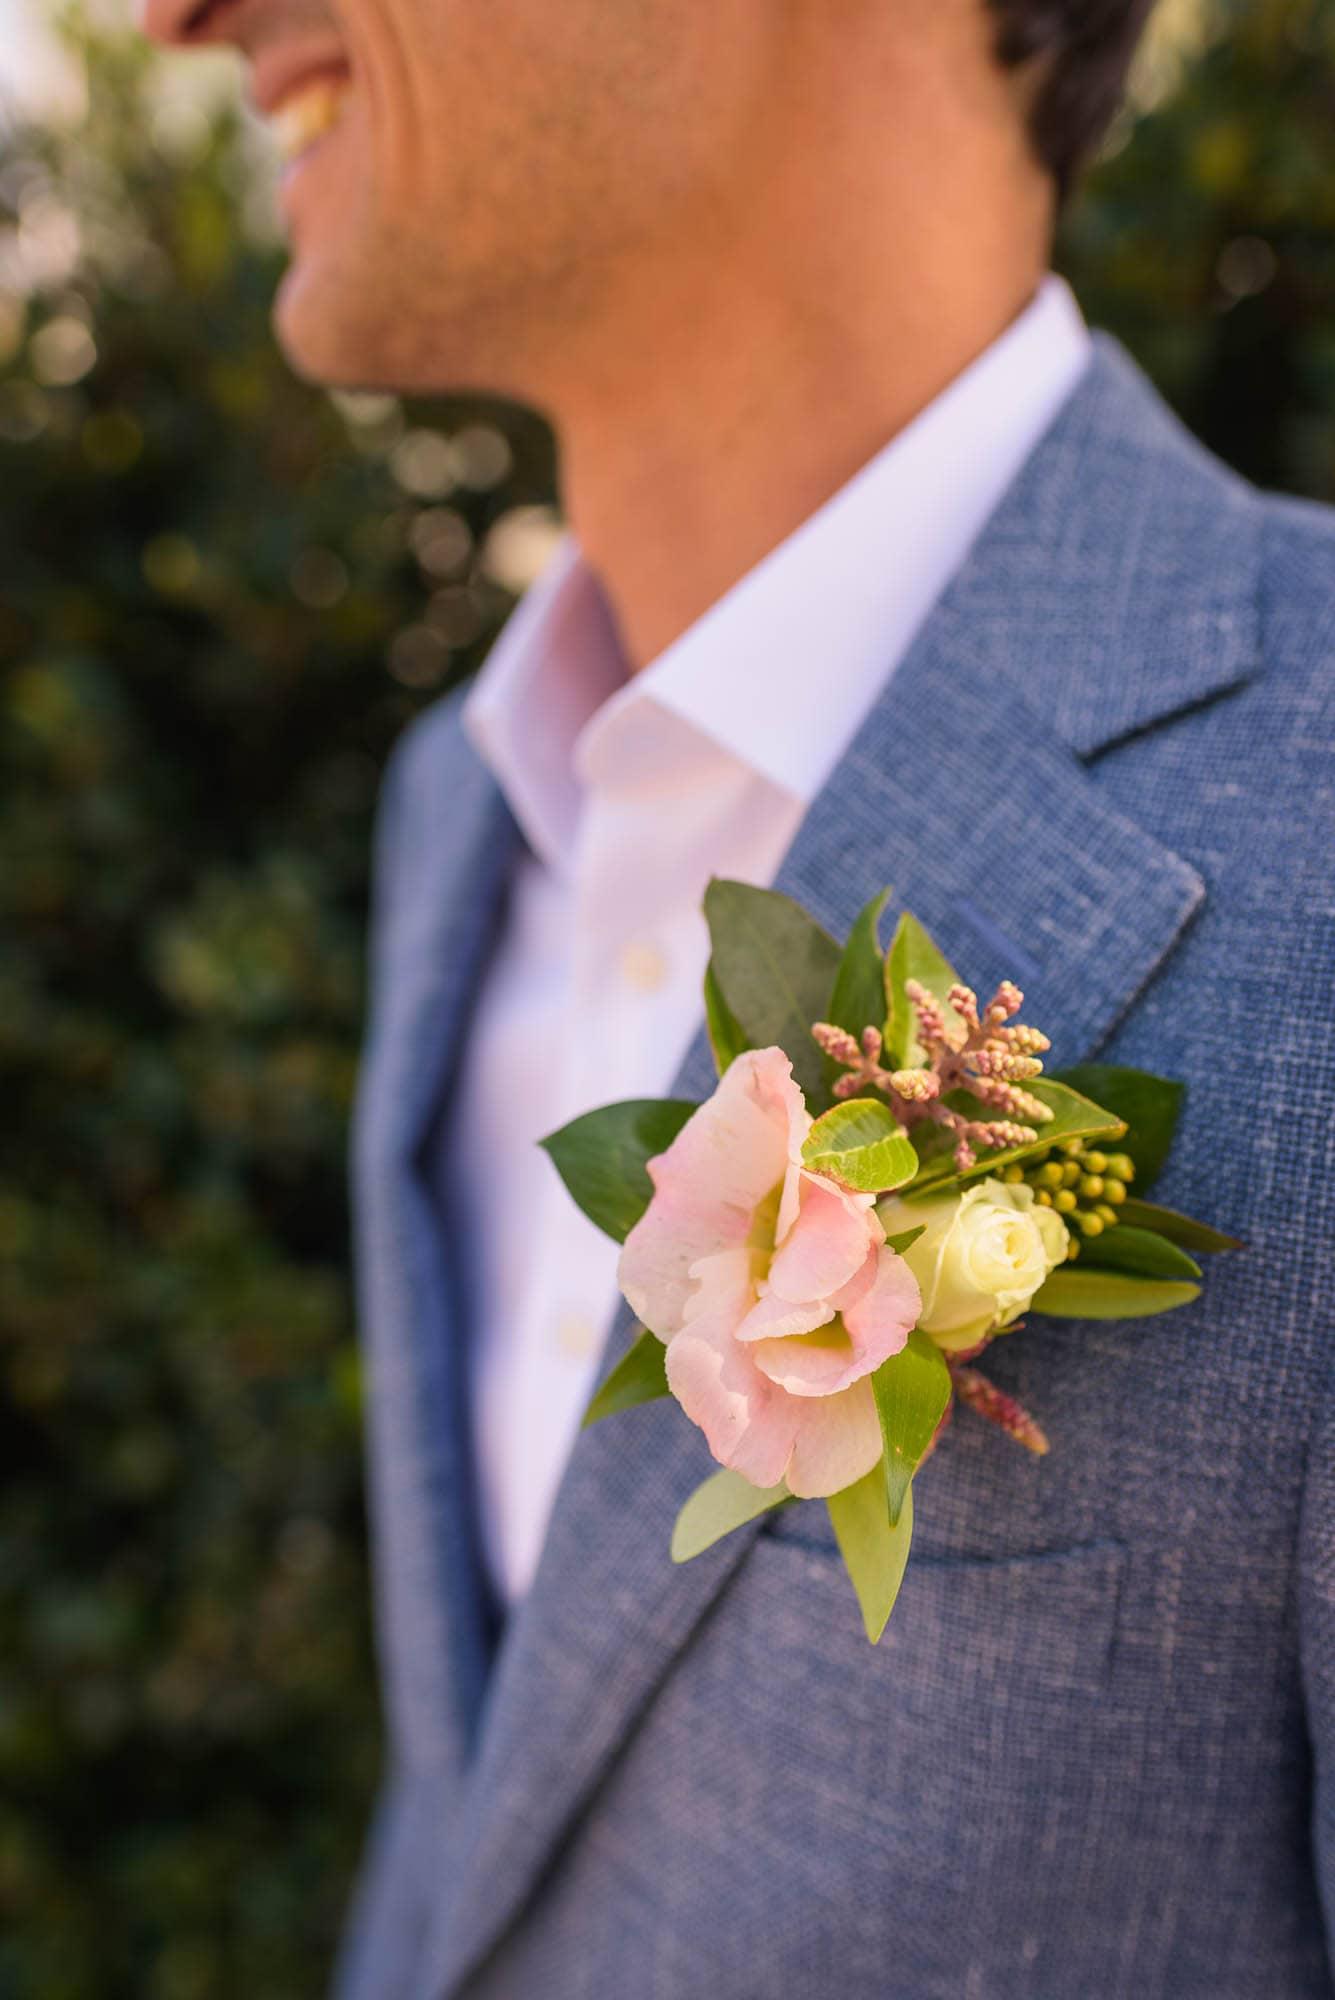 005_Alan_and_Heidi_Wedding_Verena_Andreas